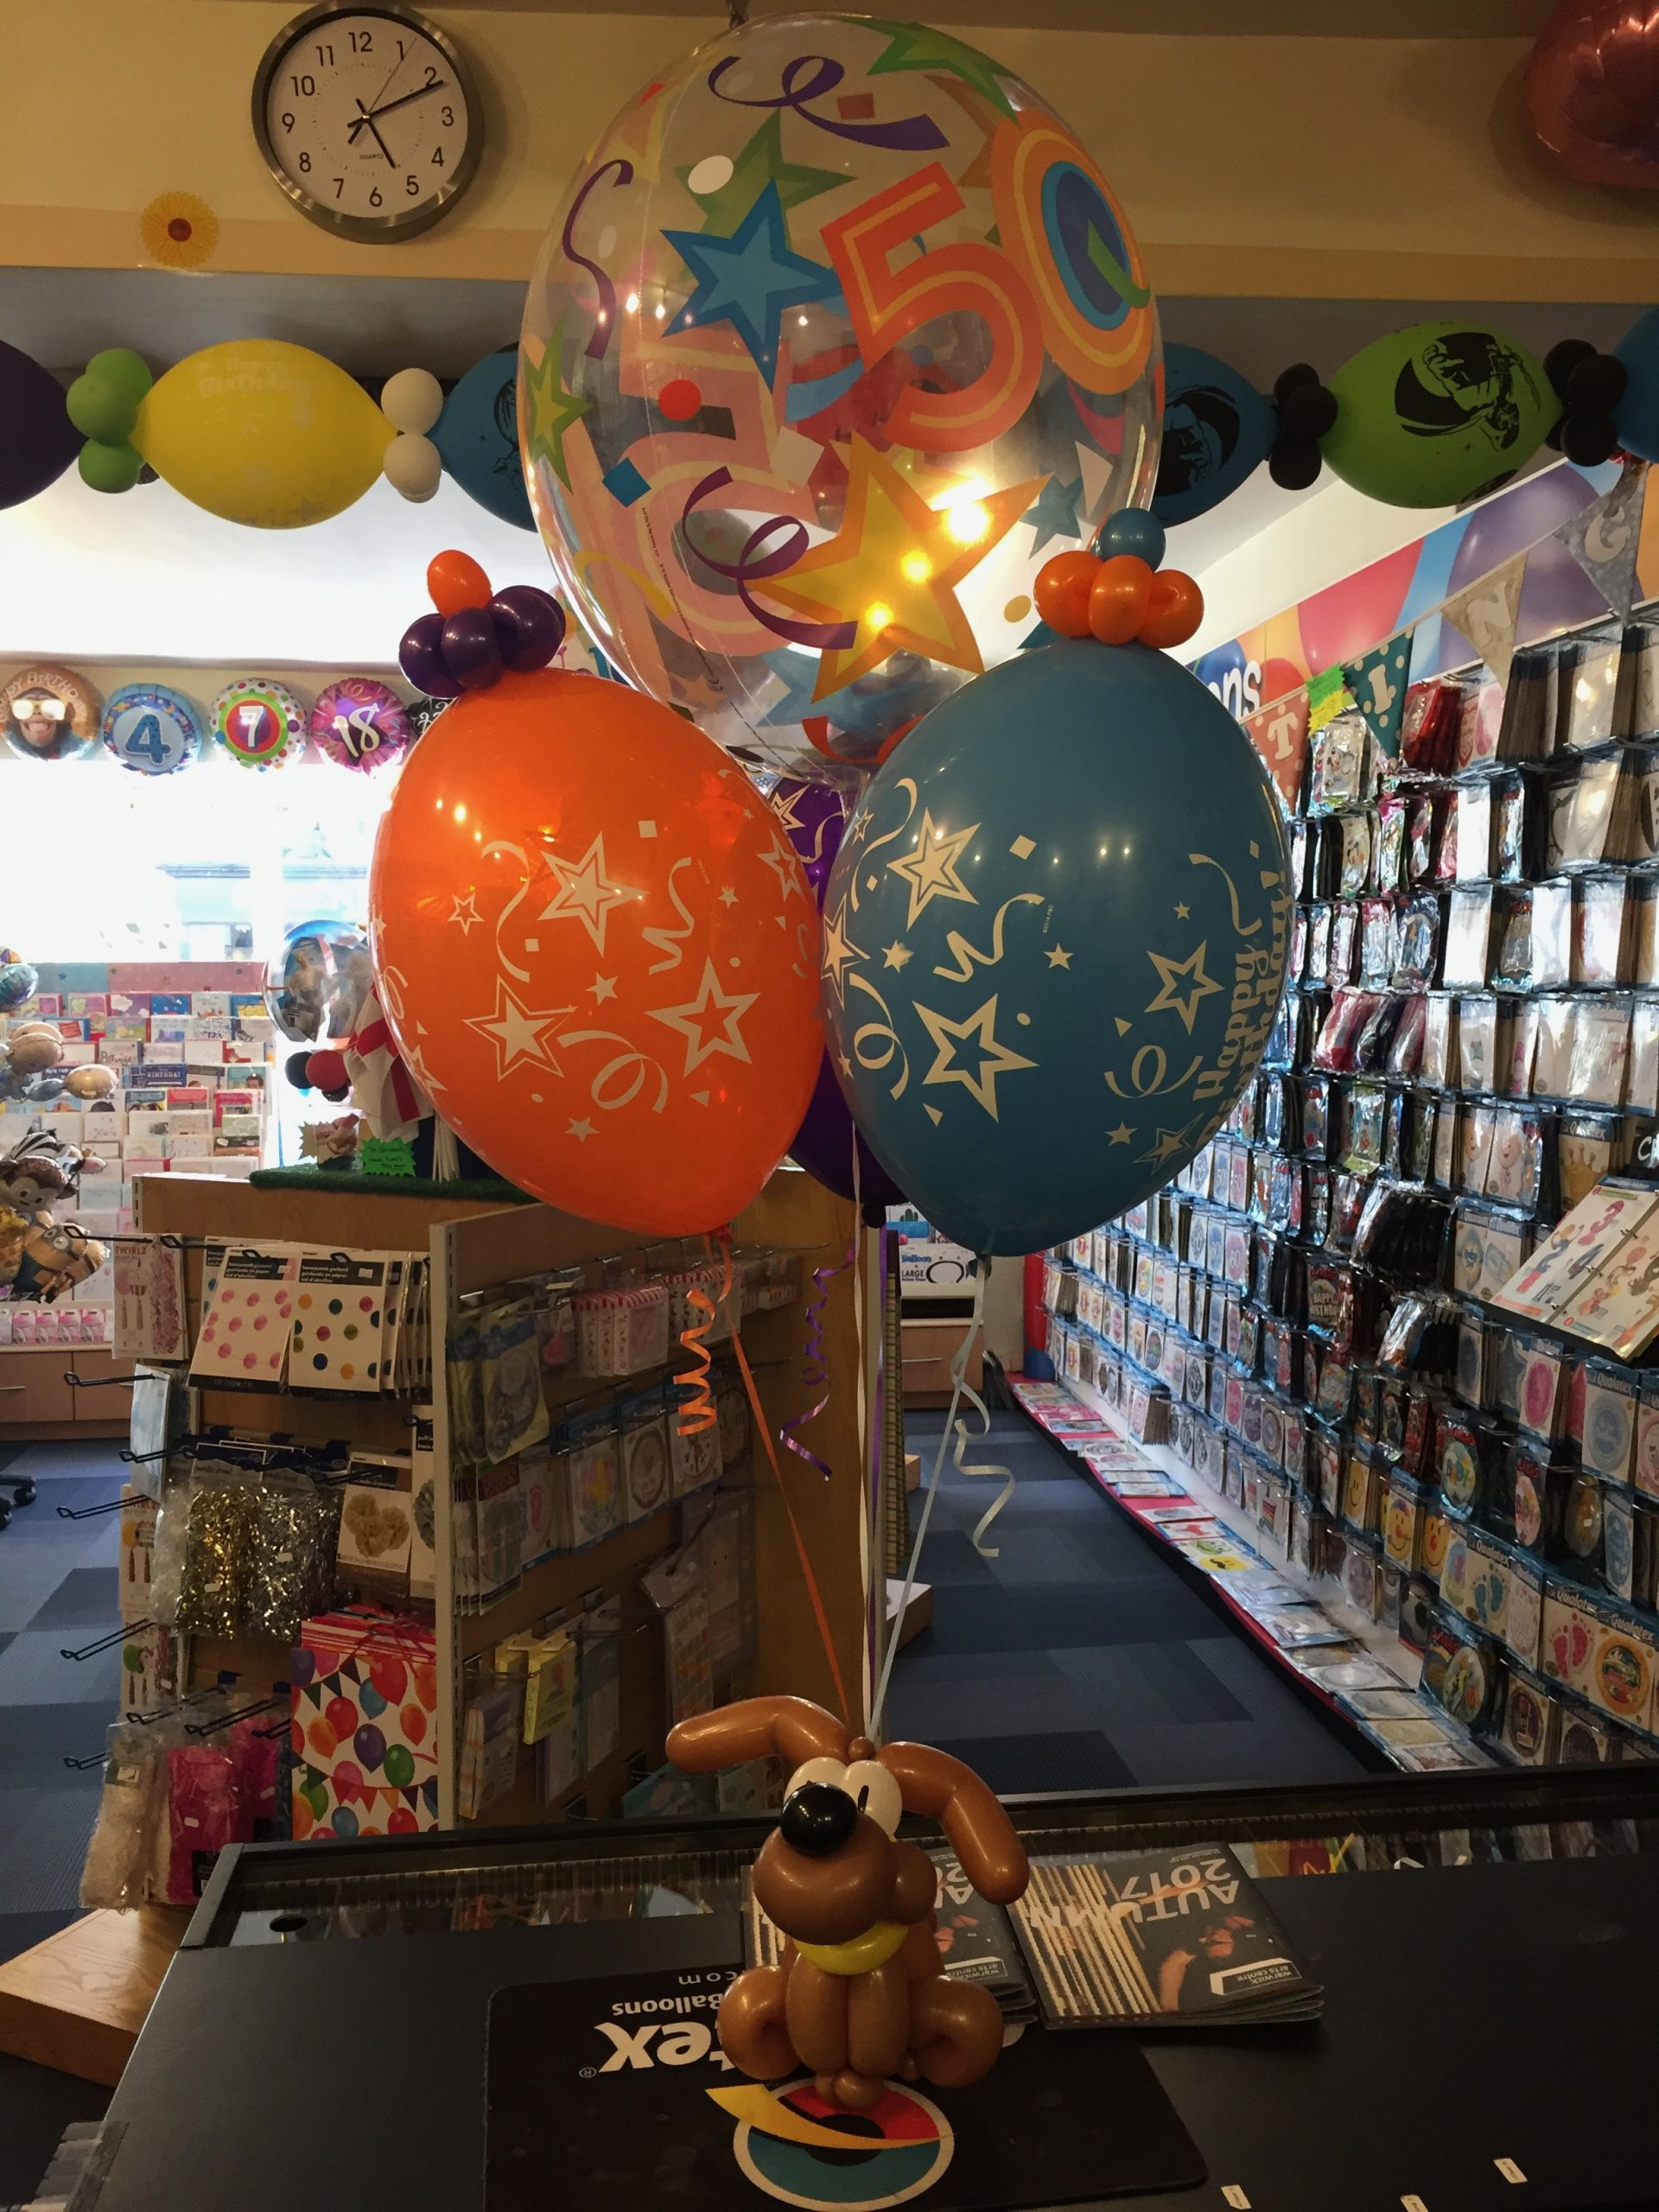 50th birthday balloons with balloon dog base